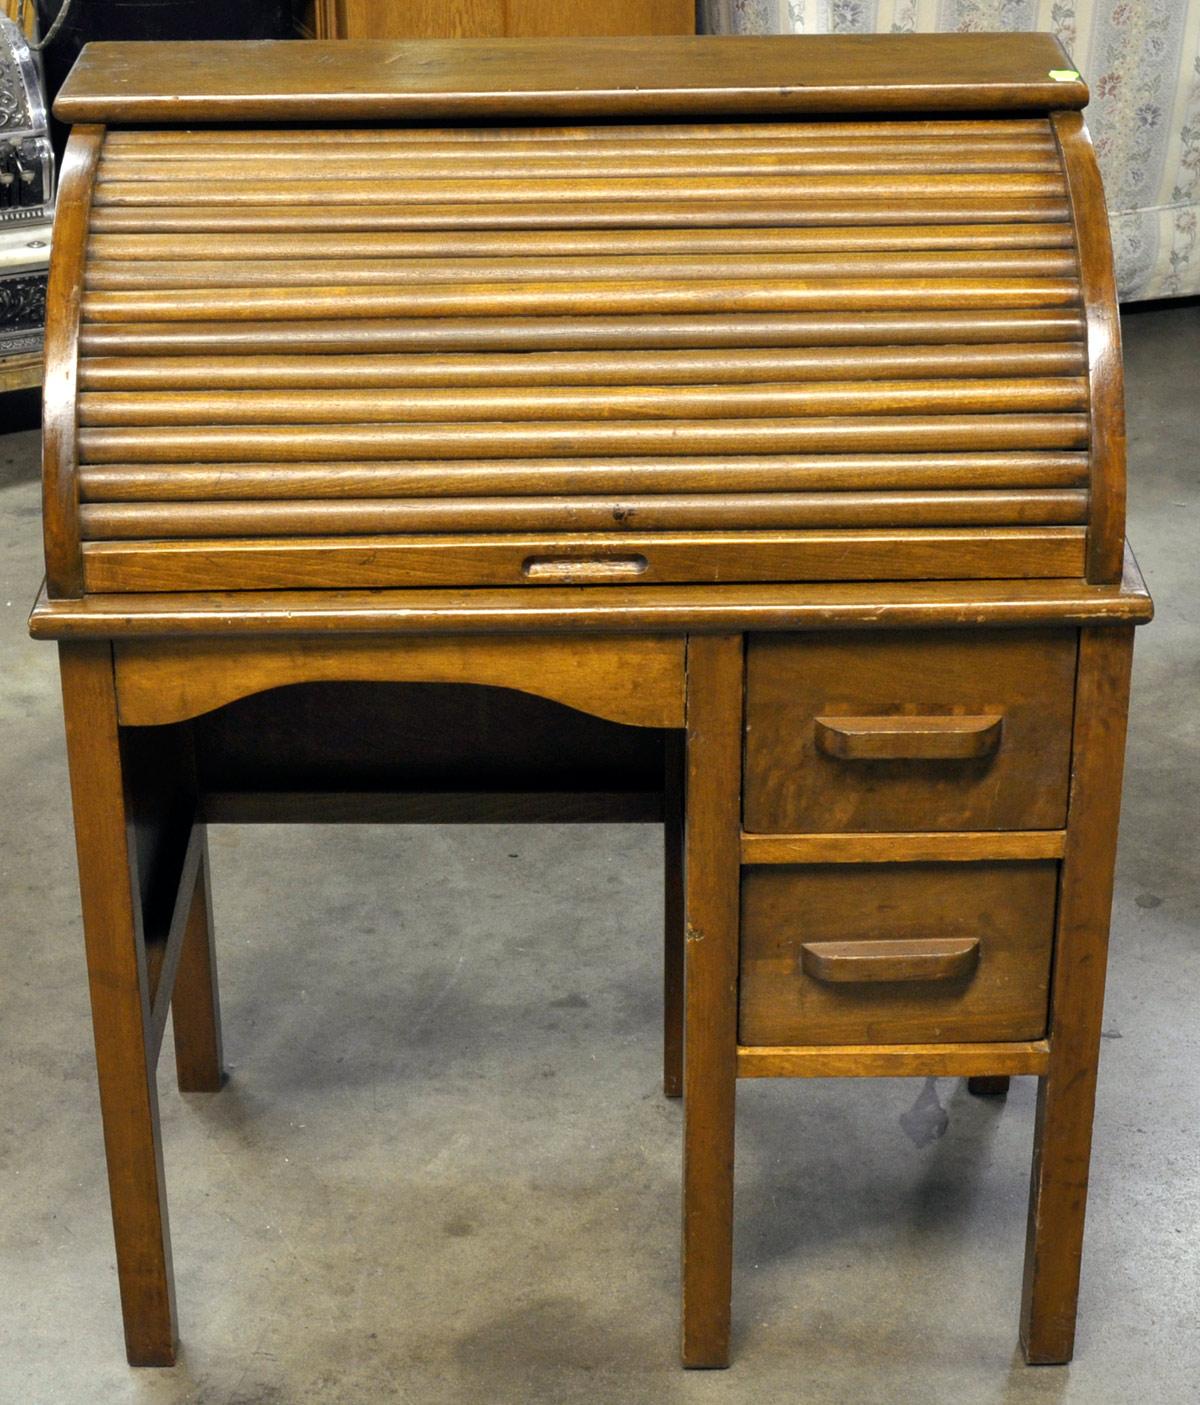 Antique Childs Roll Top Desk Antique Furniture